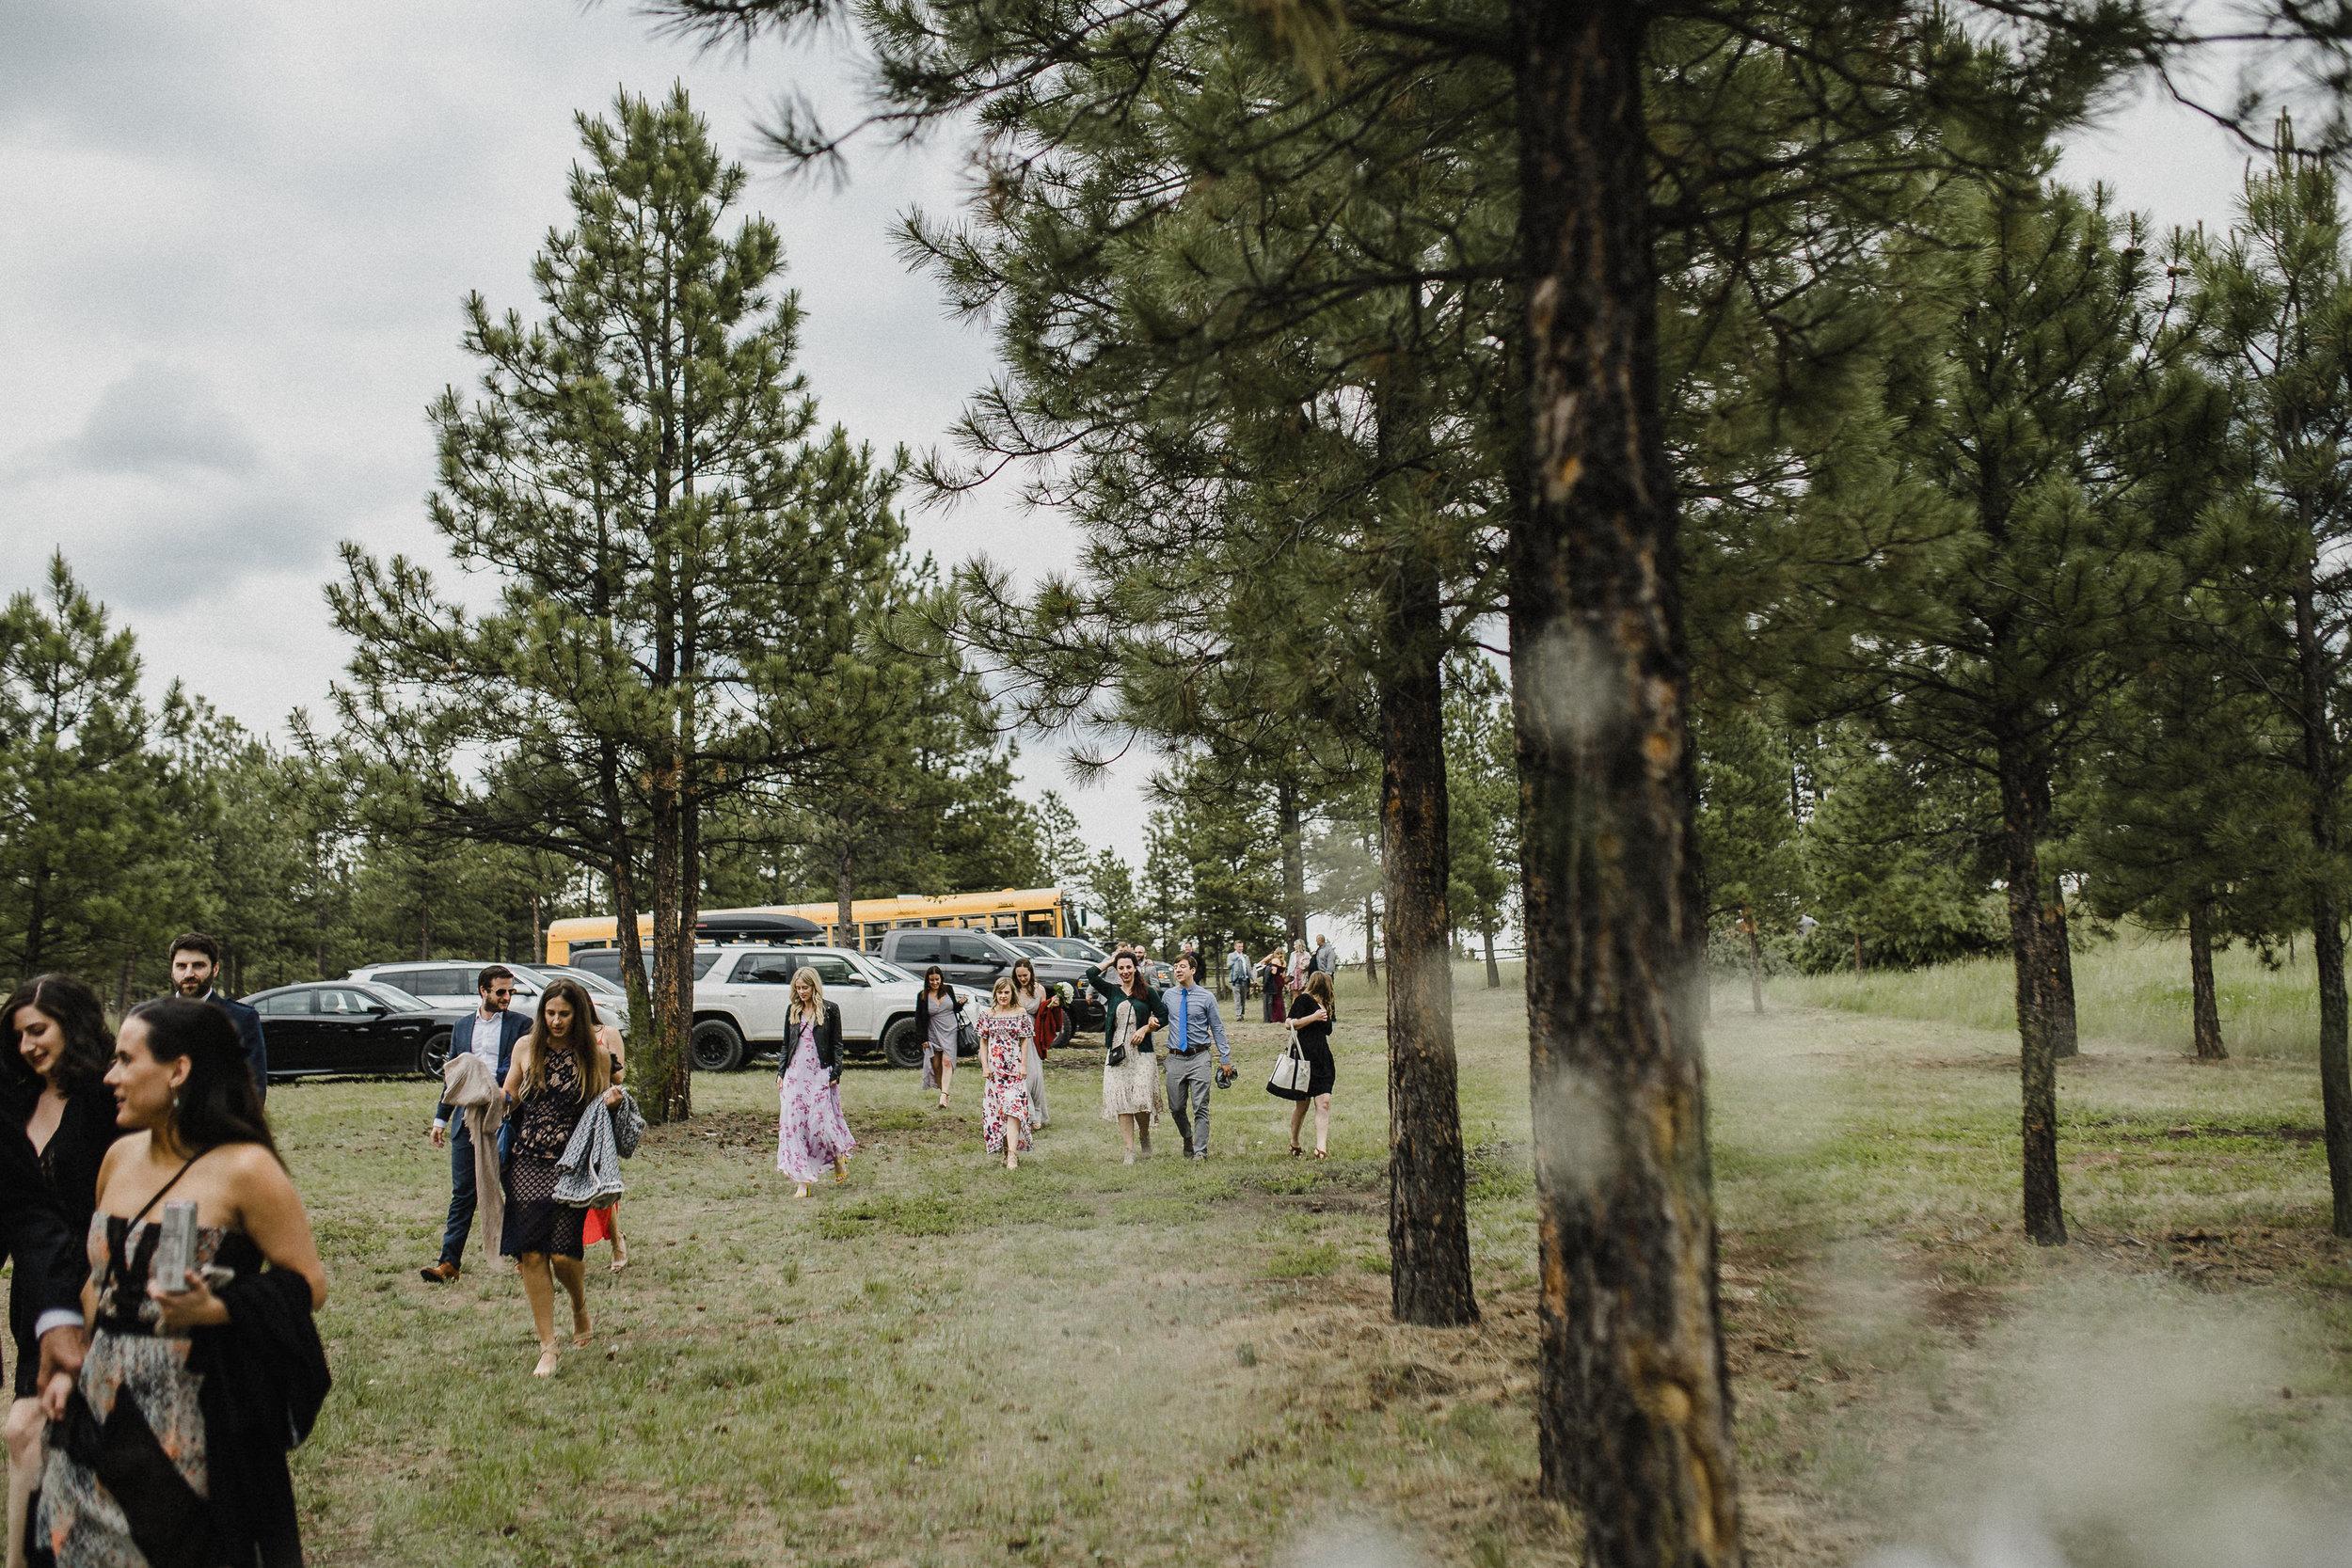 Summer star ranch wedding reception in Montana